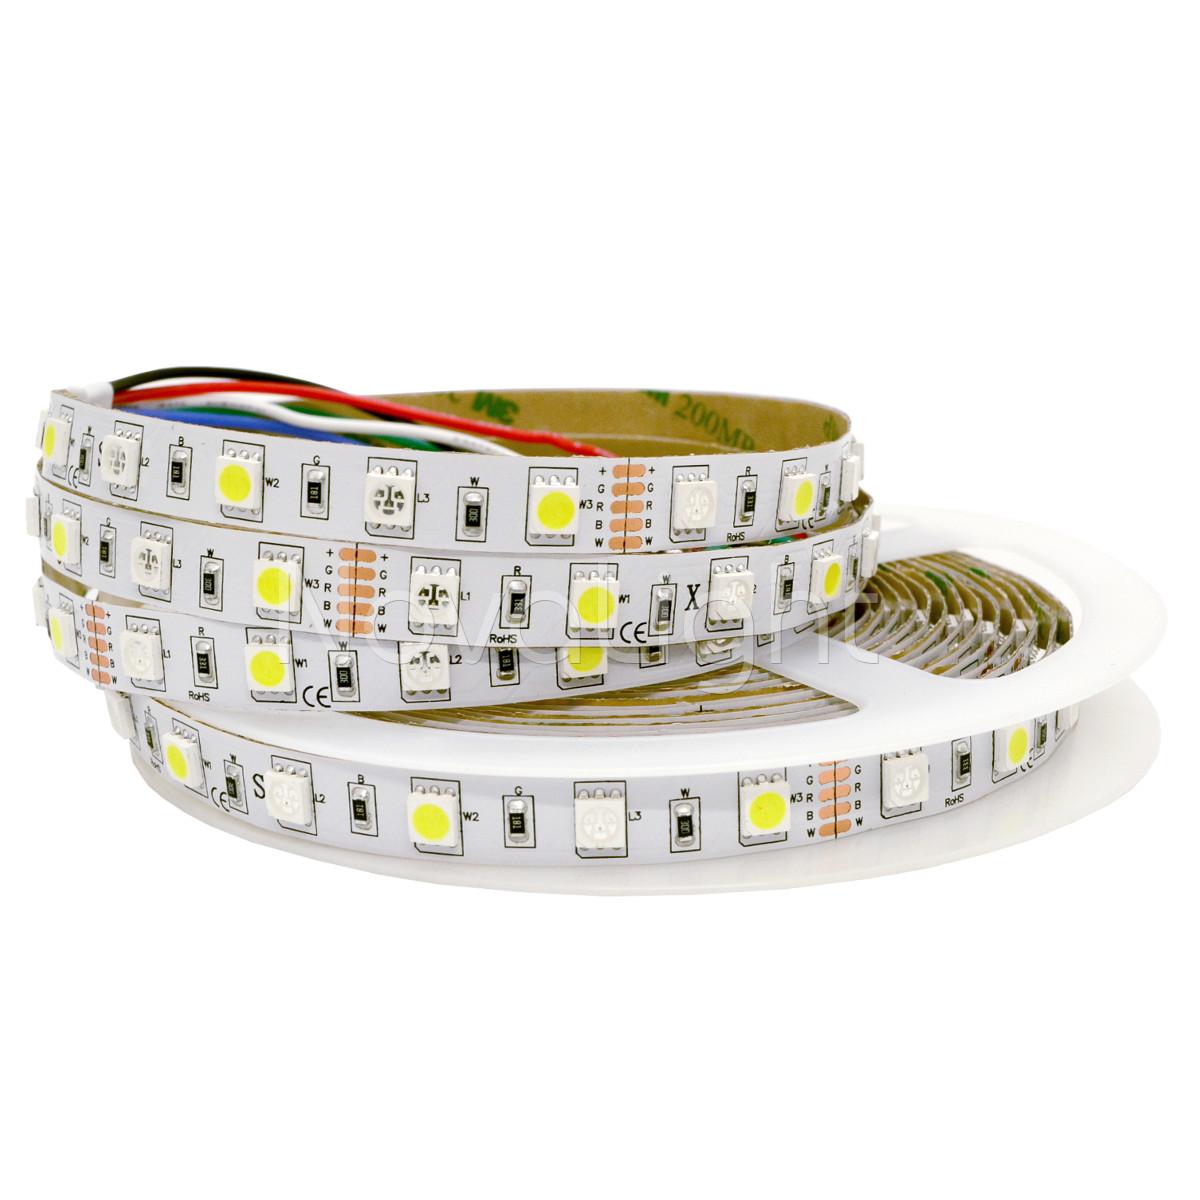 Tira LED RGBW Blanco y Multicolor 300 LED 5050 IP20 12v 5mt